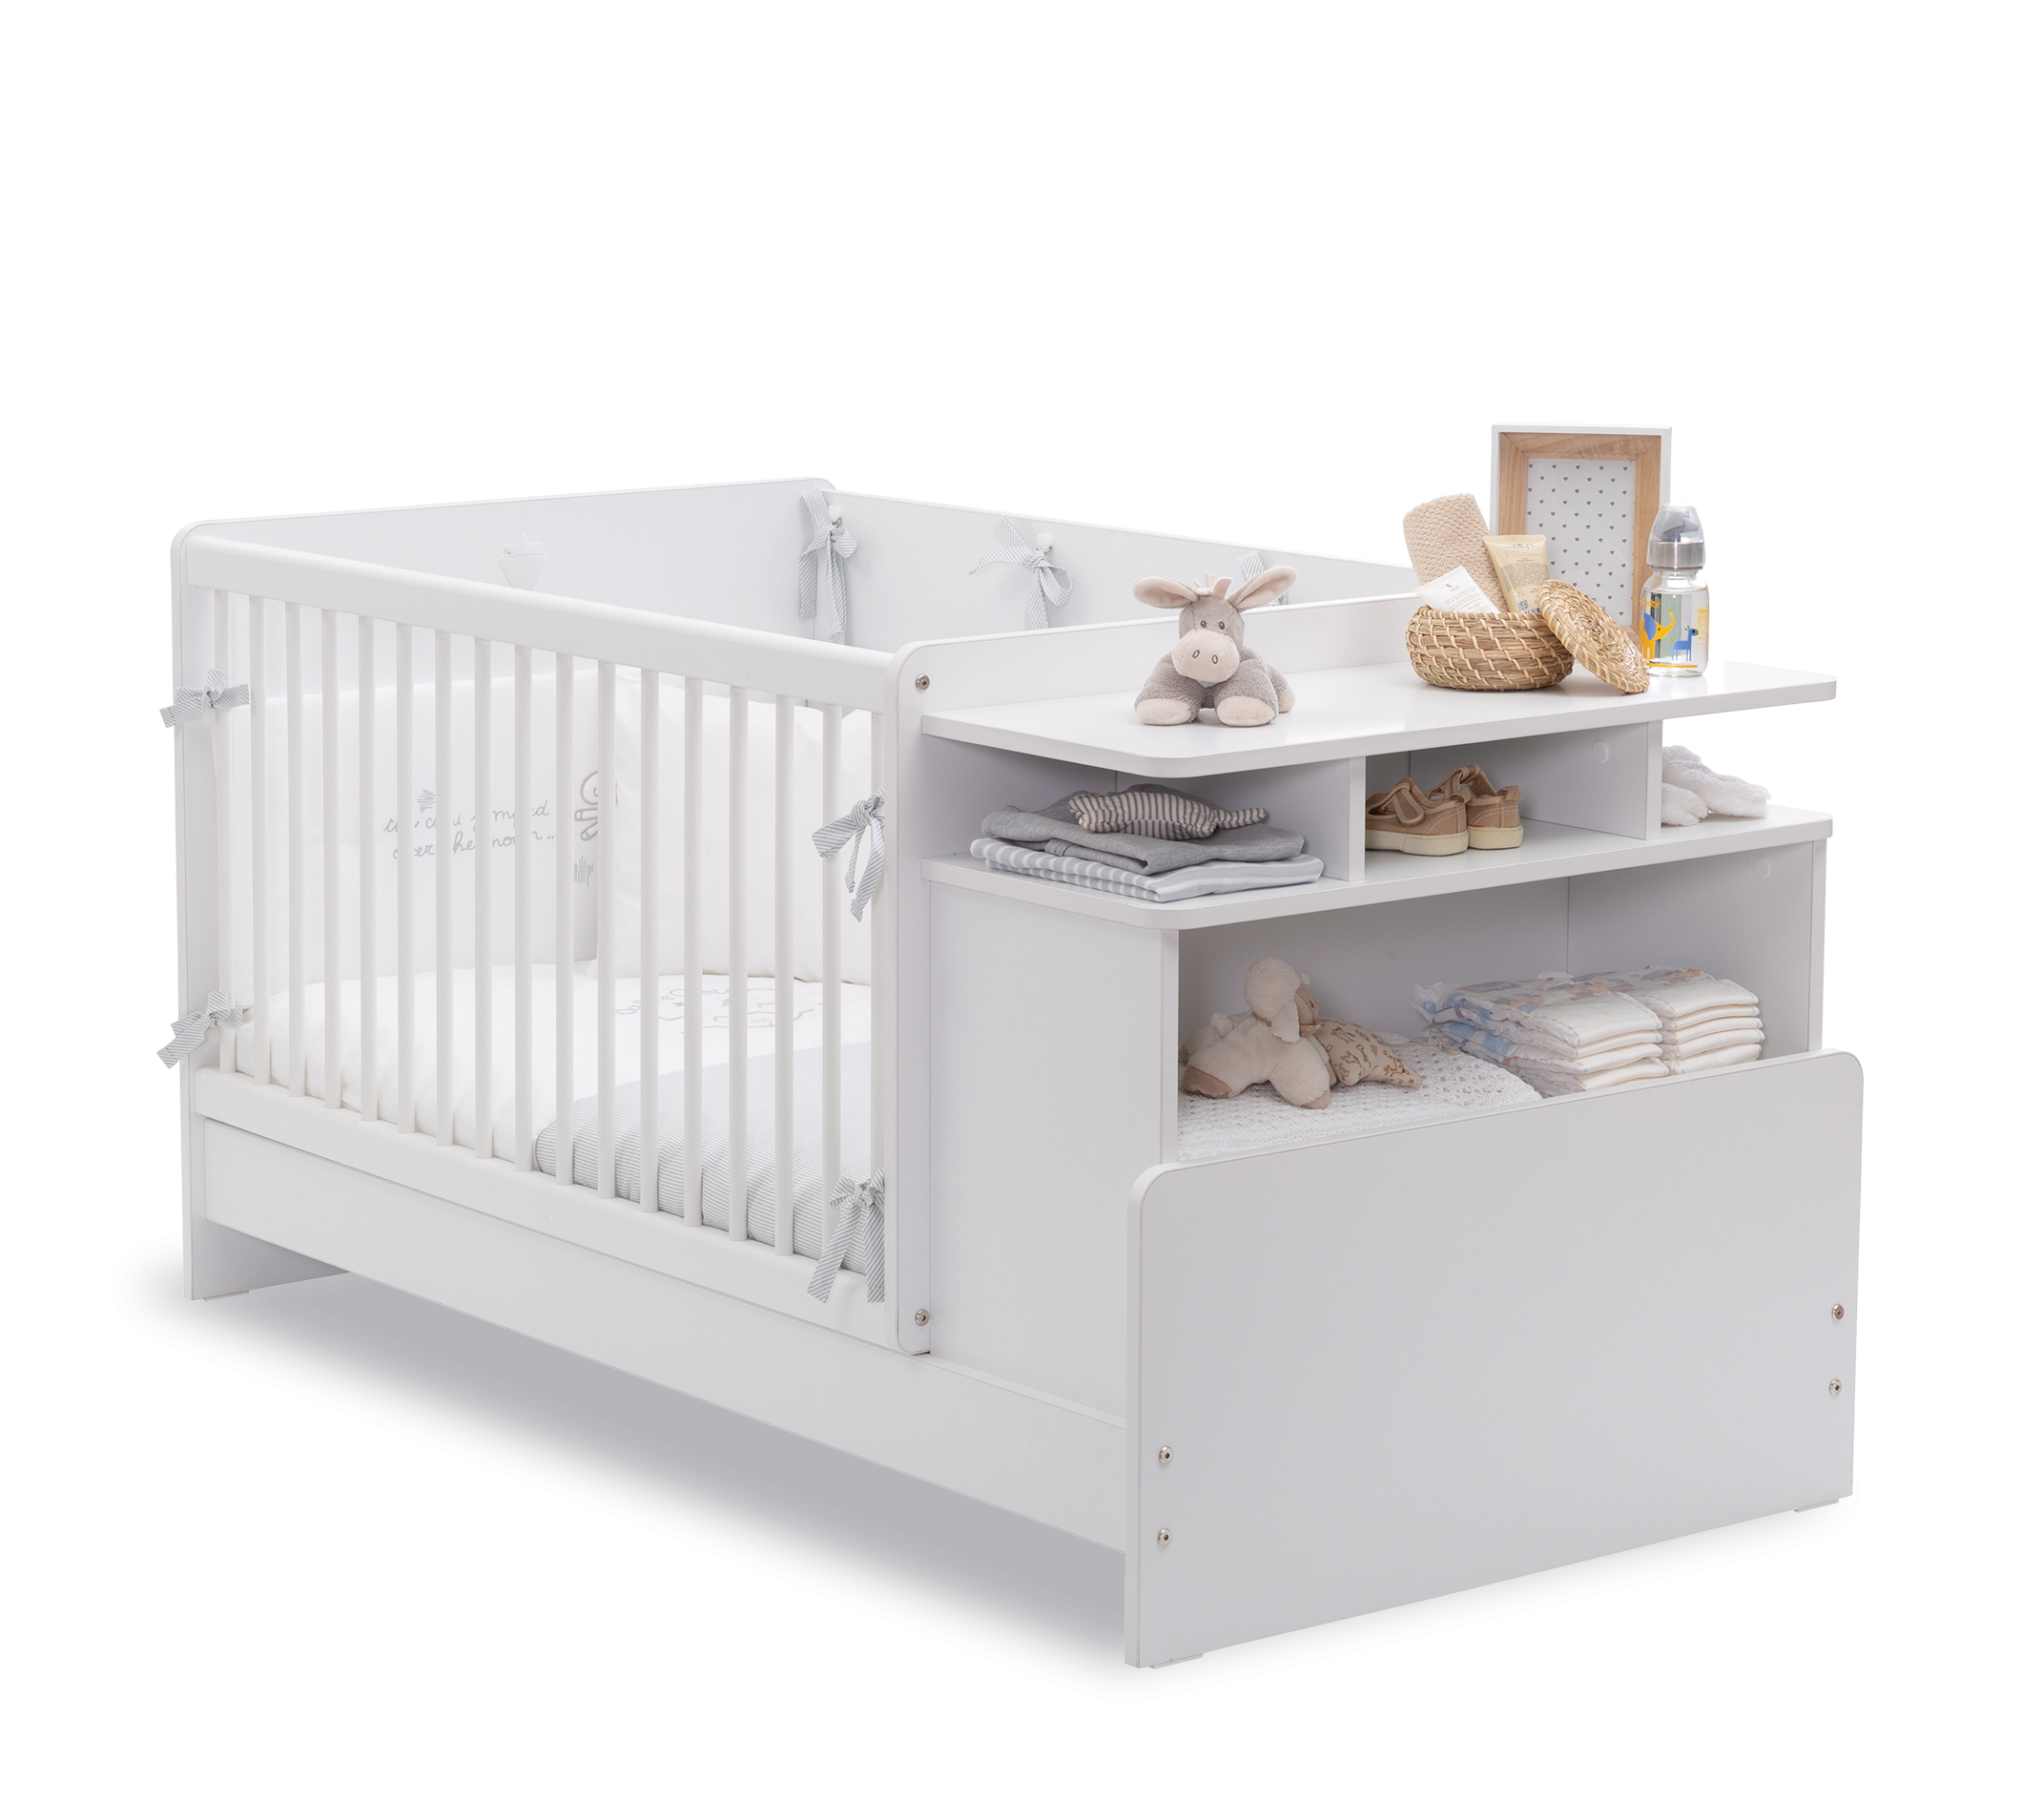 Patut transformabil din pal pentru bebe Masali Baby Alb 110 x 70 cm